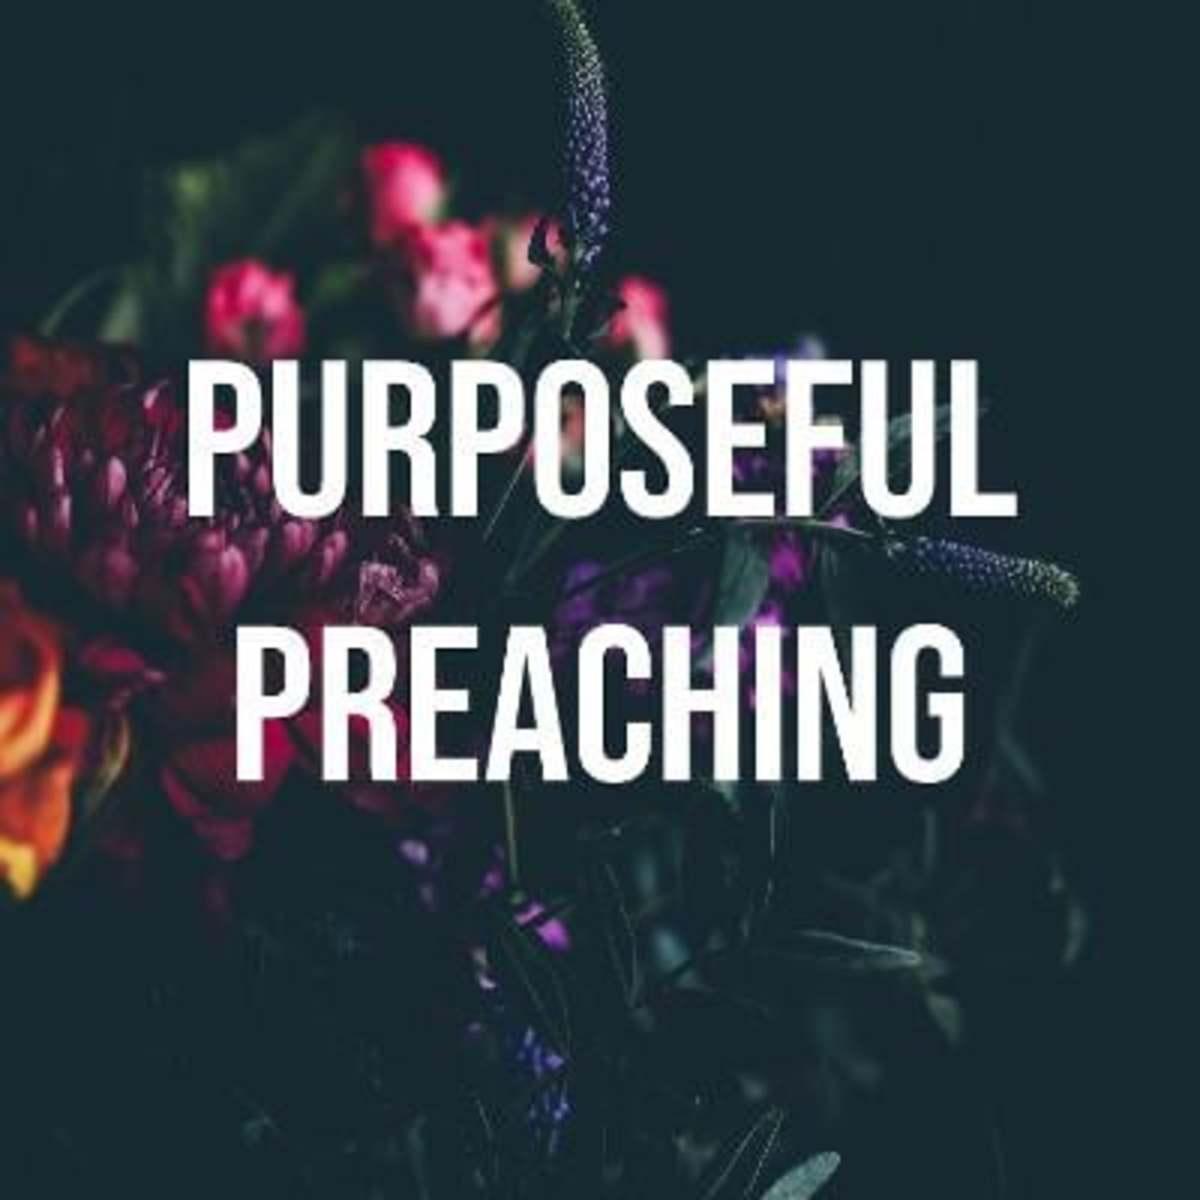 purposeful-preaching-or-just-good-advice